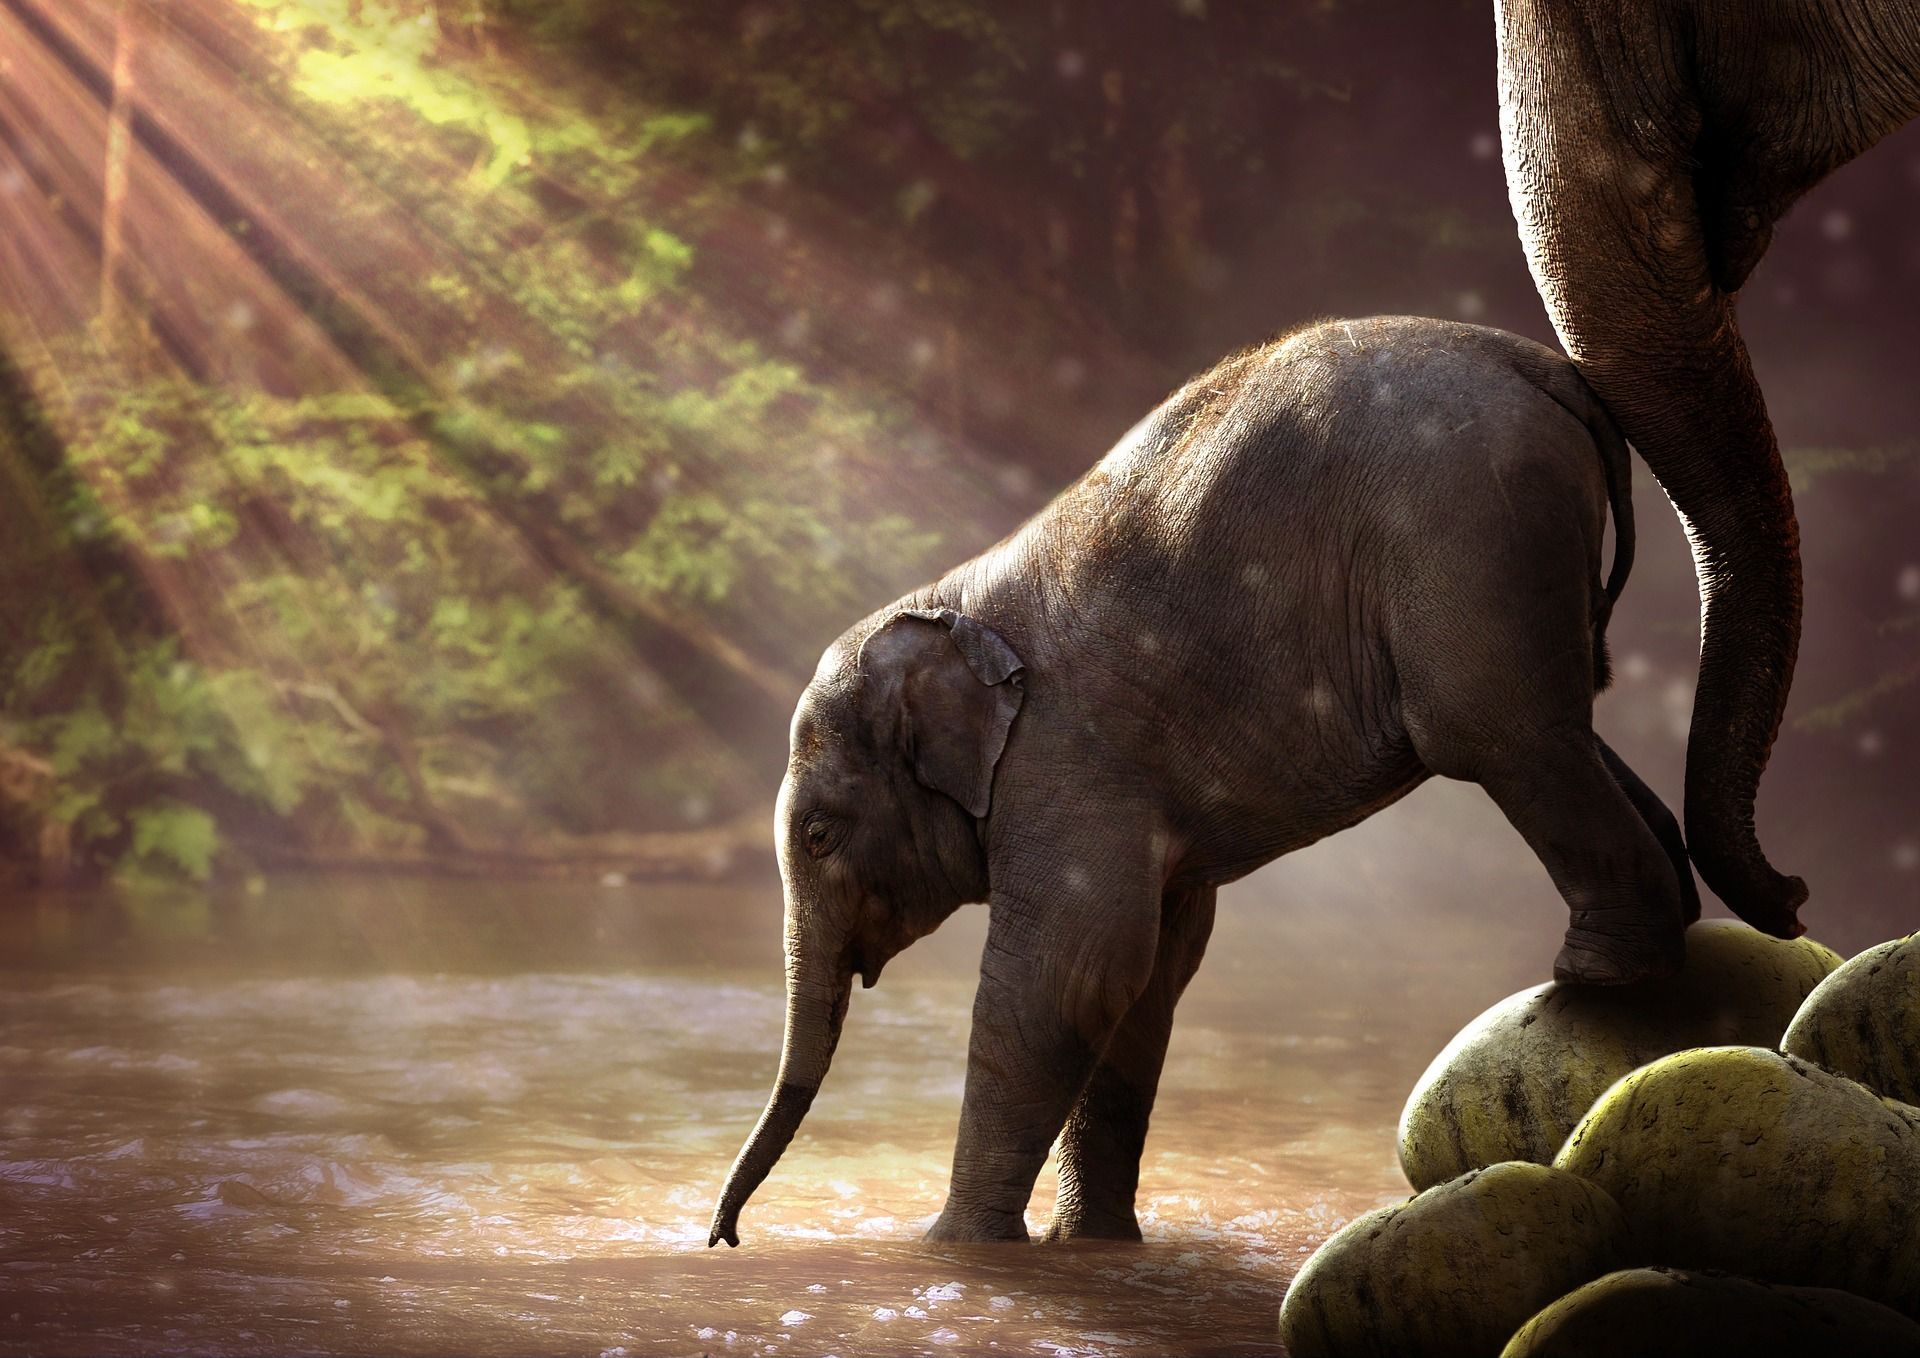 Baby Elephant Wallpapers Hd For Desktop Cute Baby Elephant Elephant Cute Animals